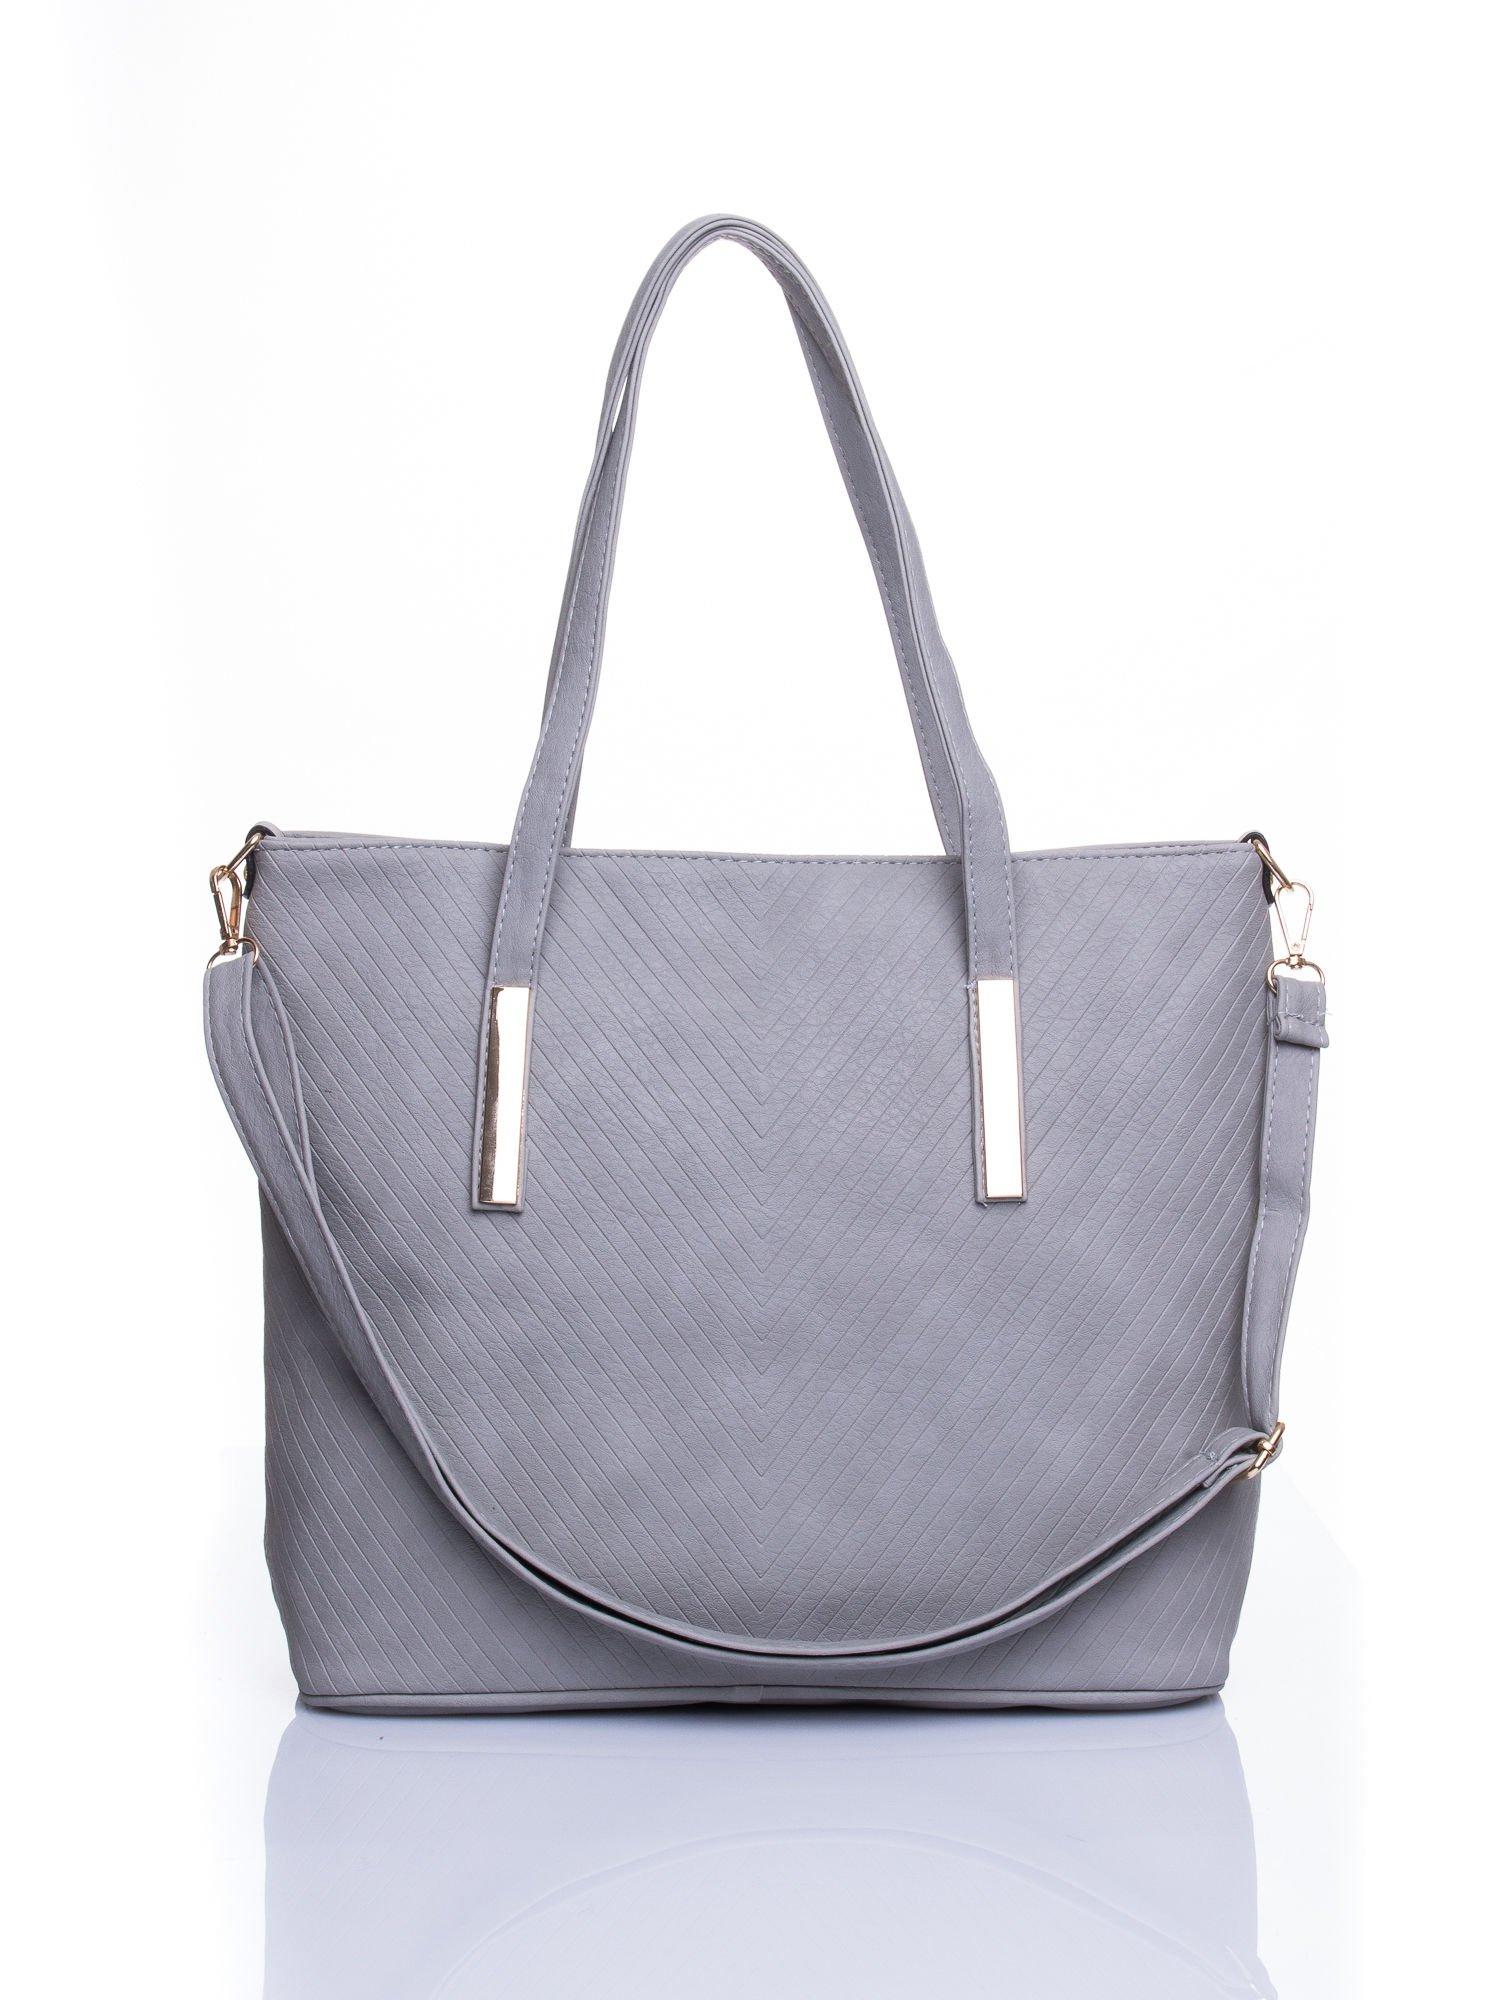 dff4ce9bd5d65 Szara fakturowana torba shopper bag - Akcesoria torba - sklep eButik.pl